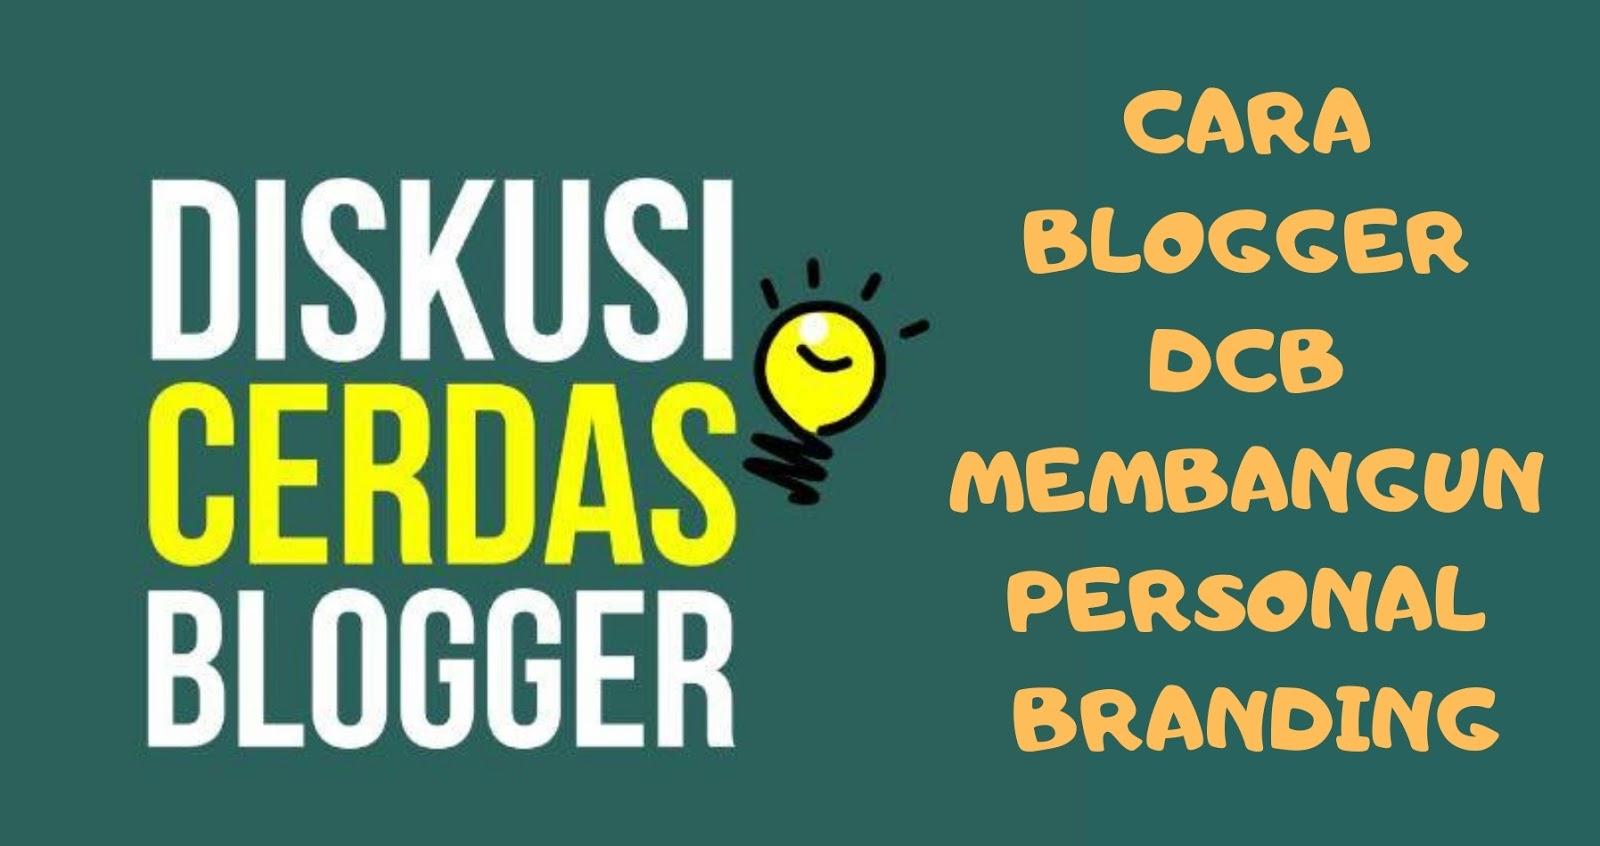 DCB Blogger